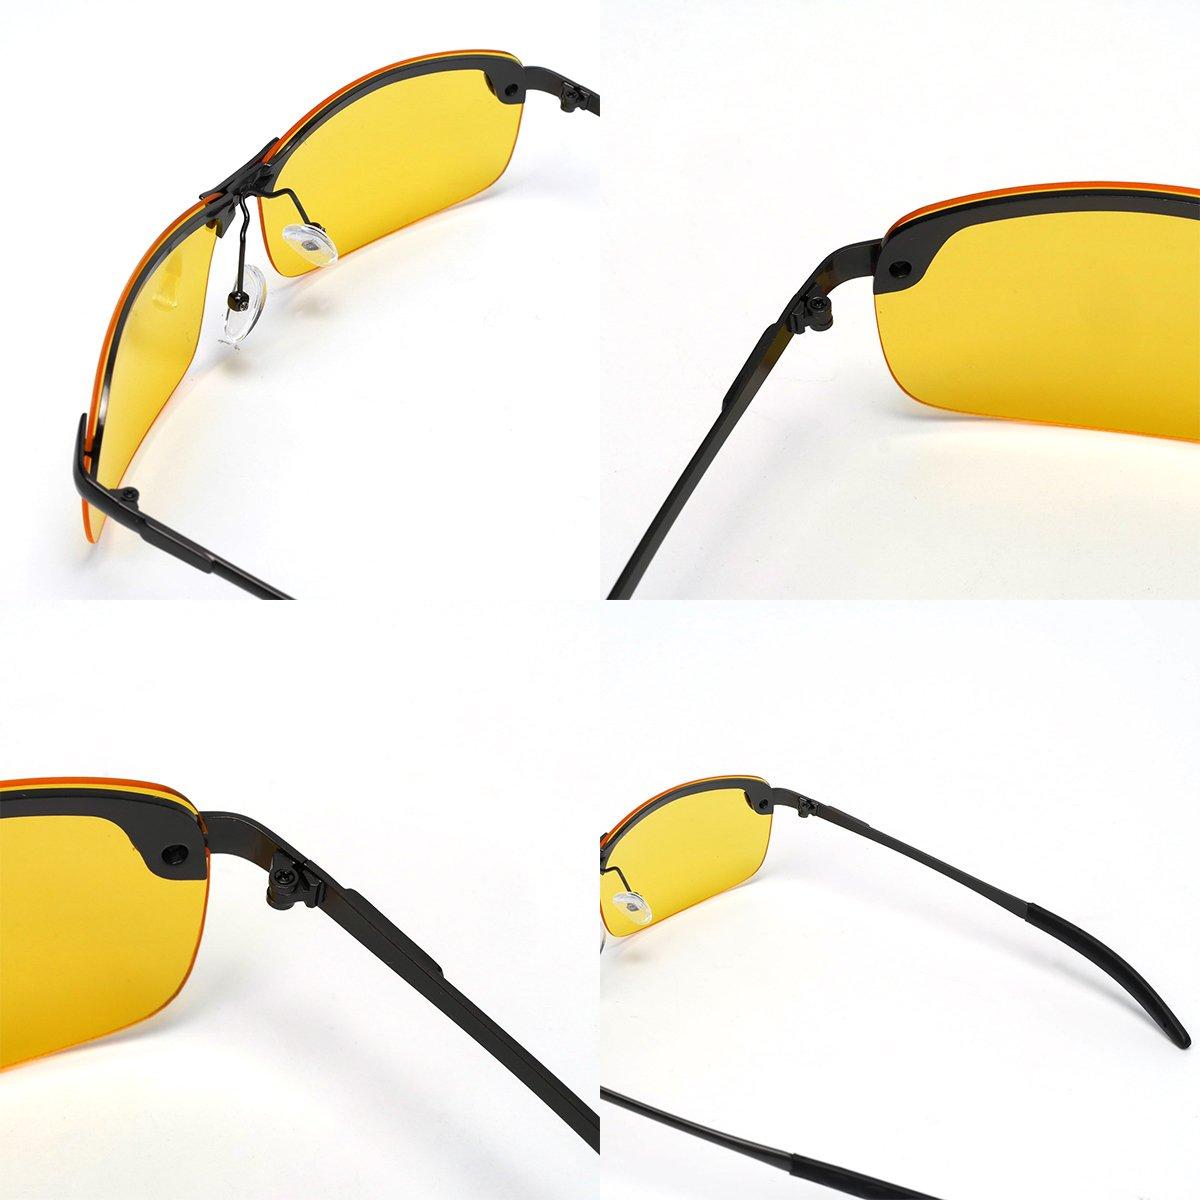 New Men High-End Night Vision Polarized UV400 Driving Glasses Aviator Sunglasses VOSO